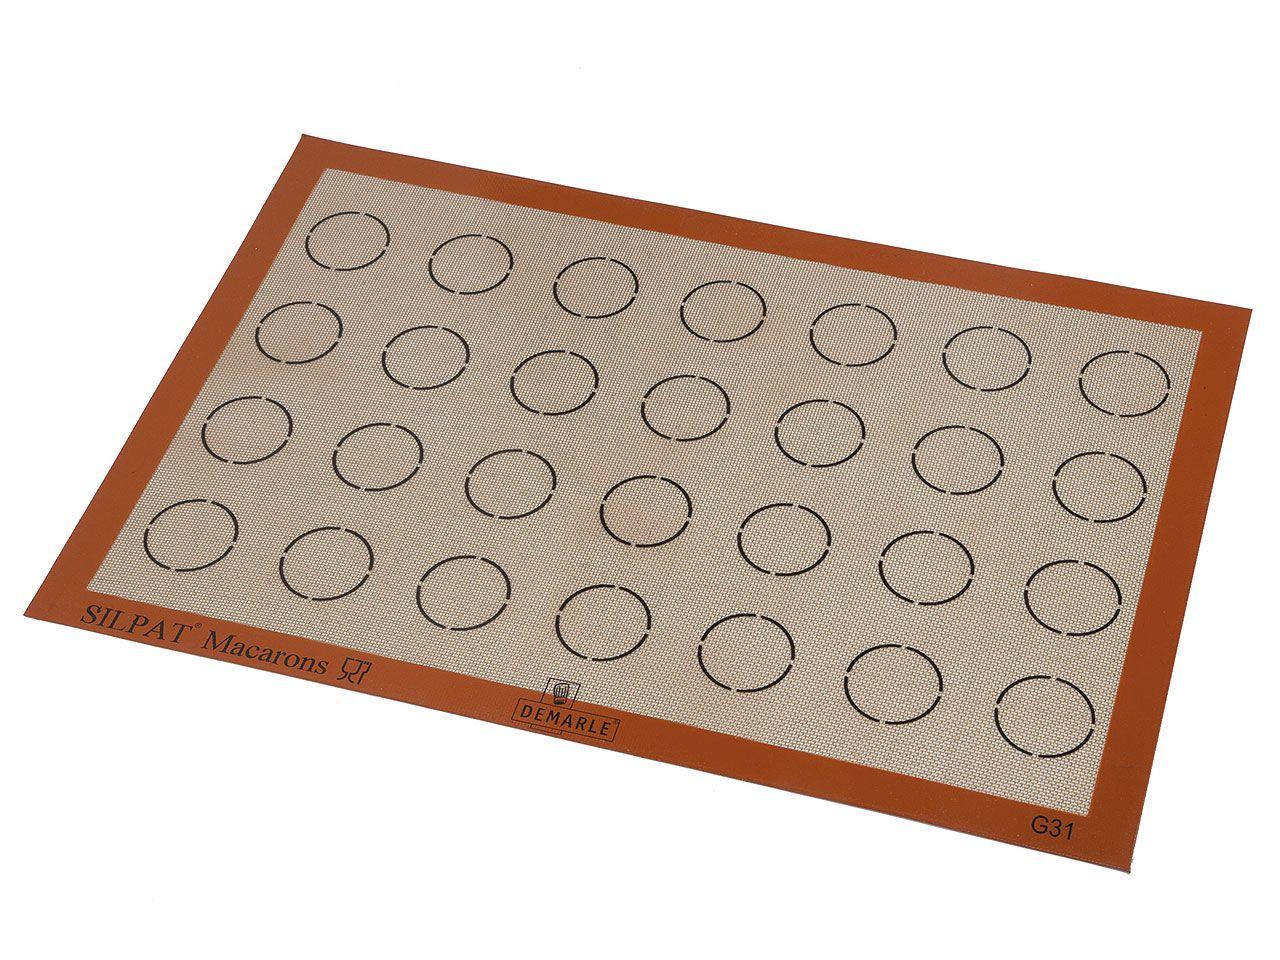 Toile à macarons Silpat (58,5 x 38,5 cm)